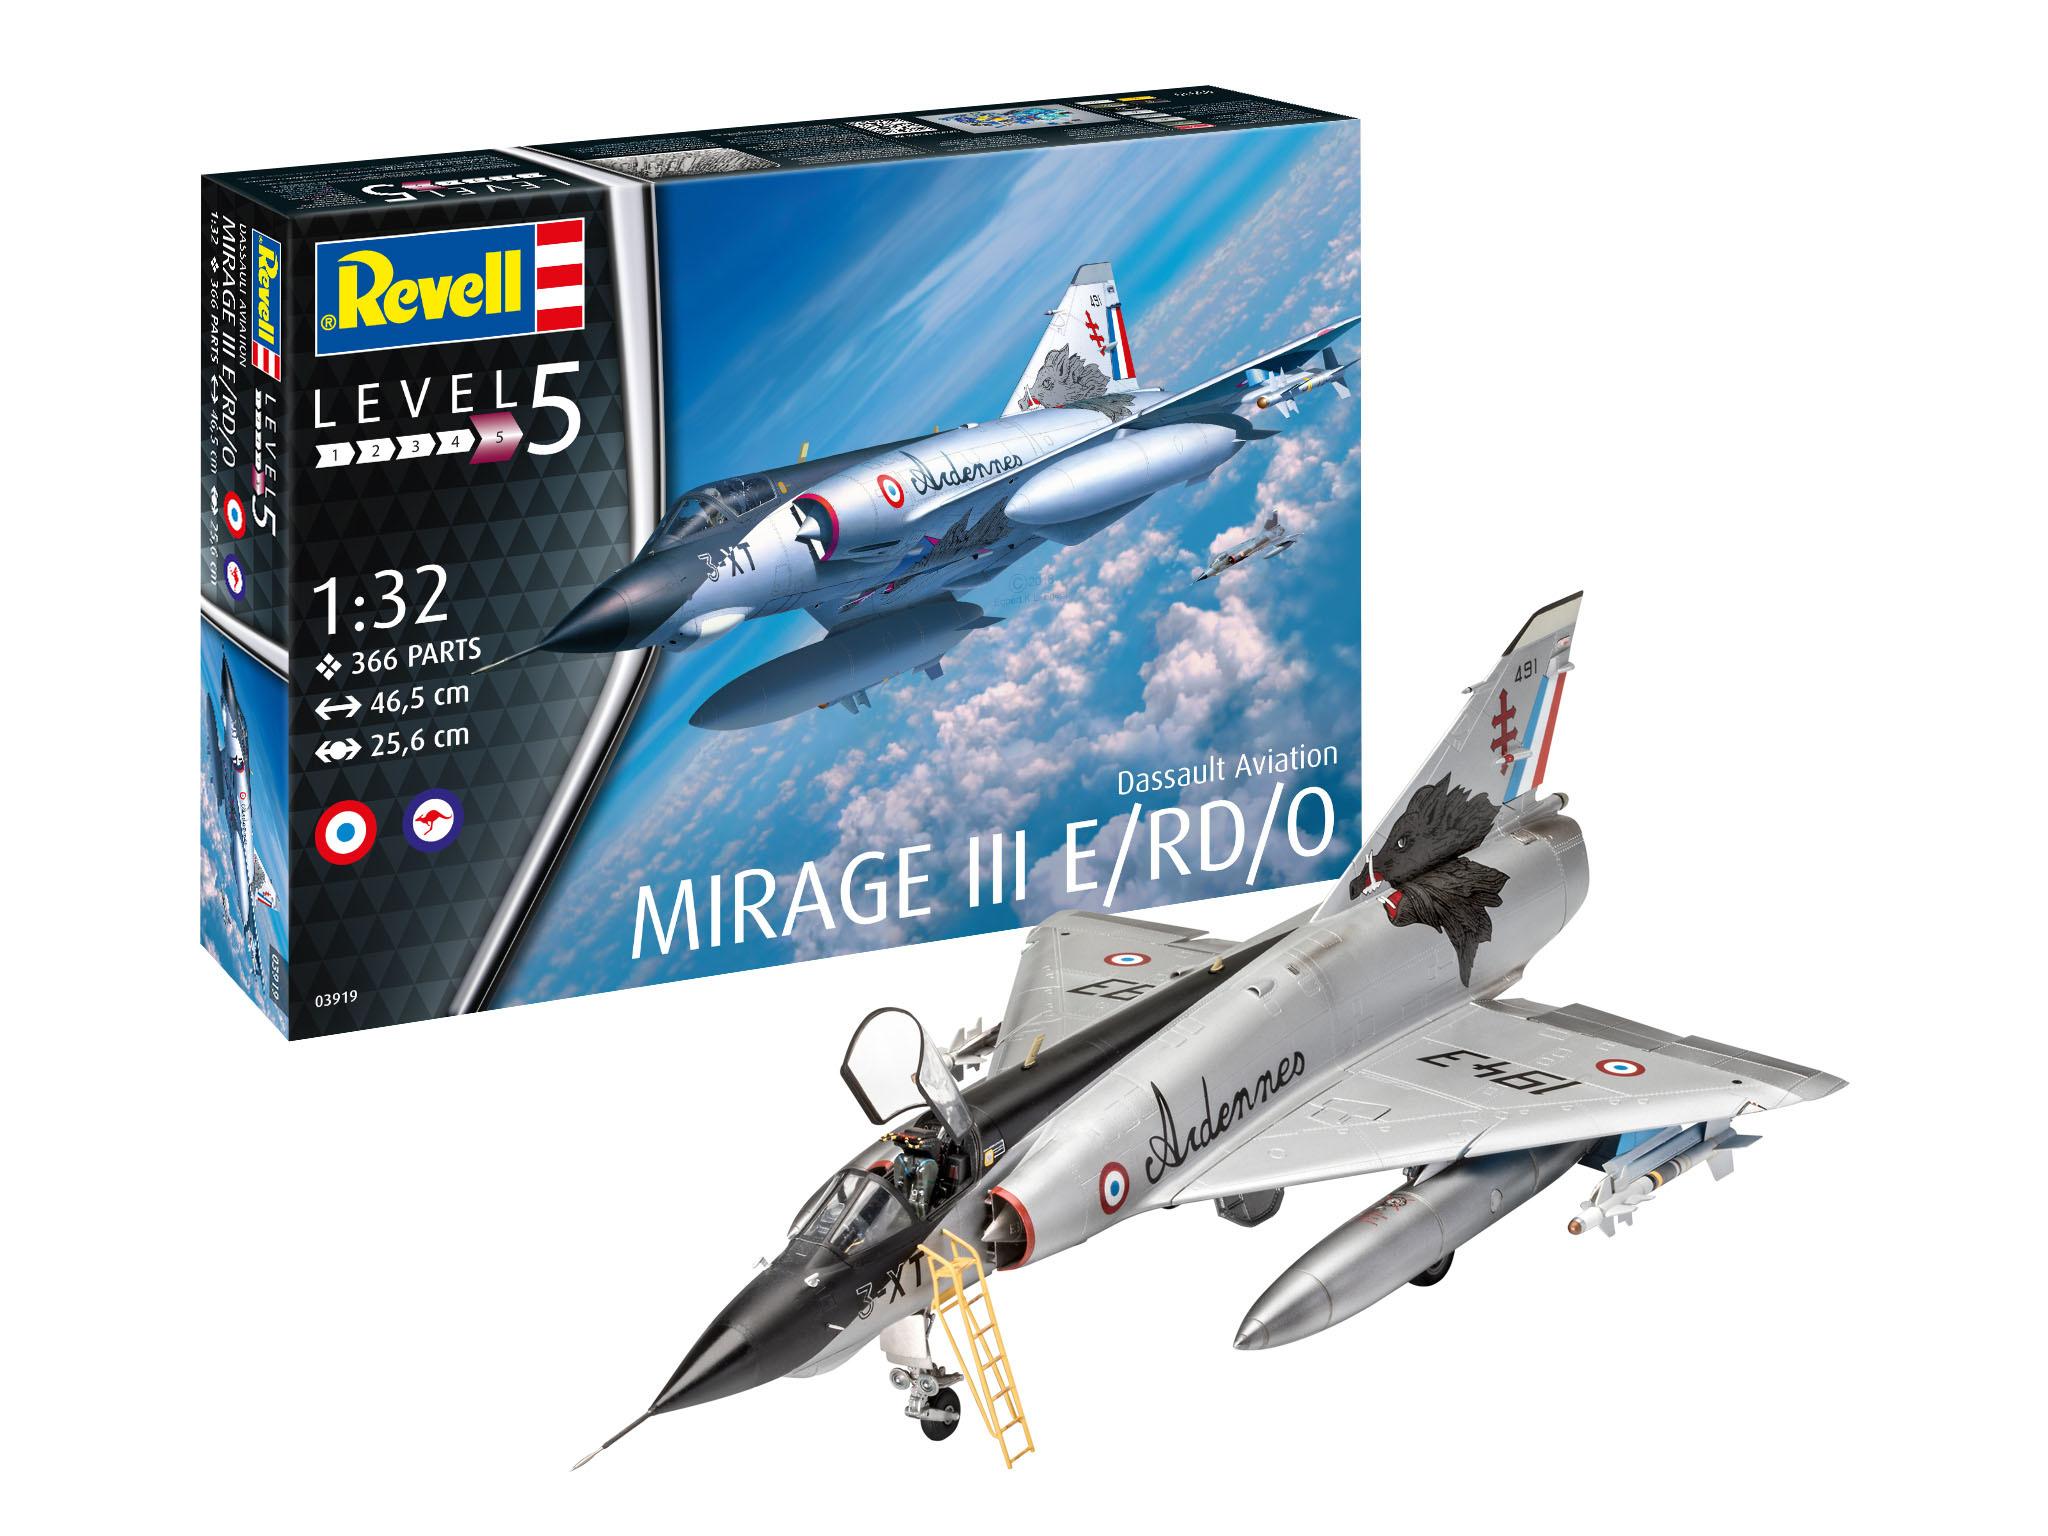 1:32 Dassault Mirage III E-1